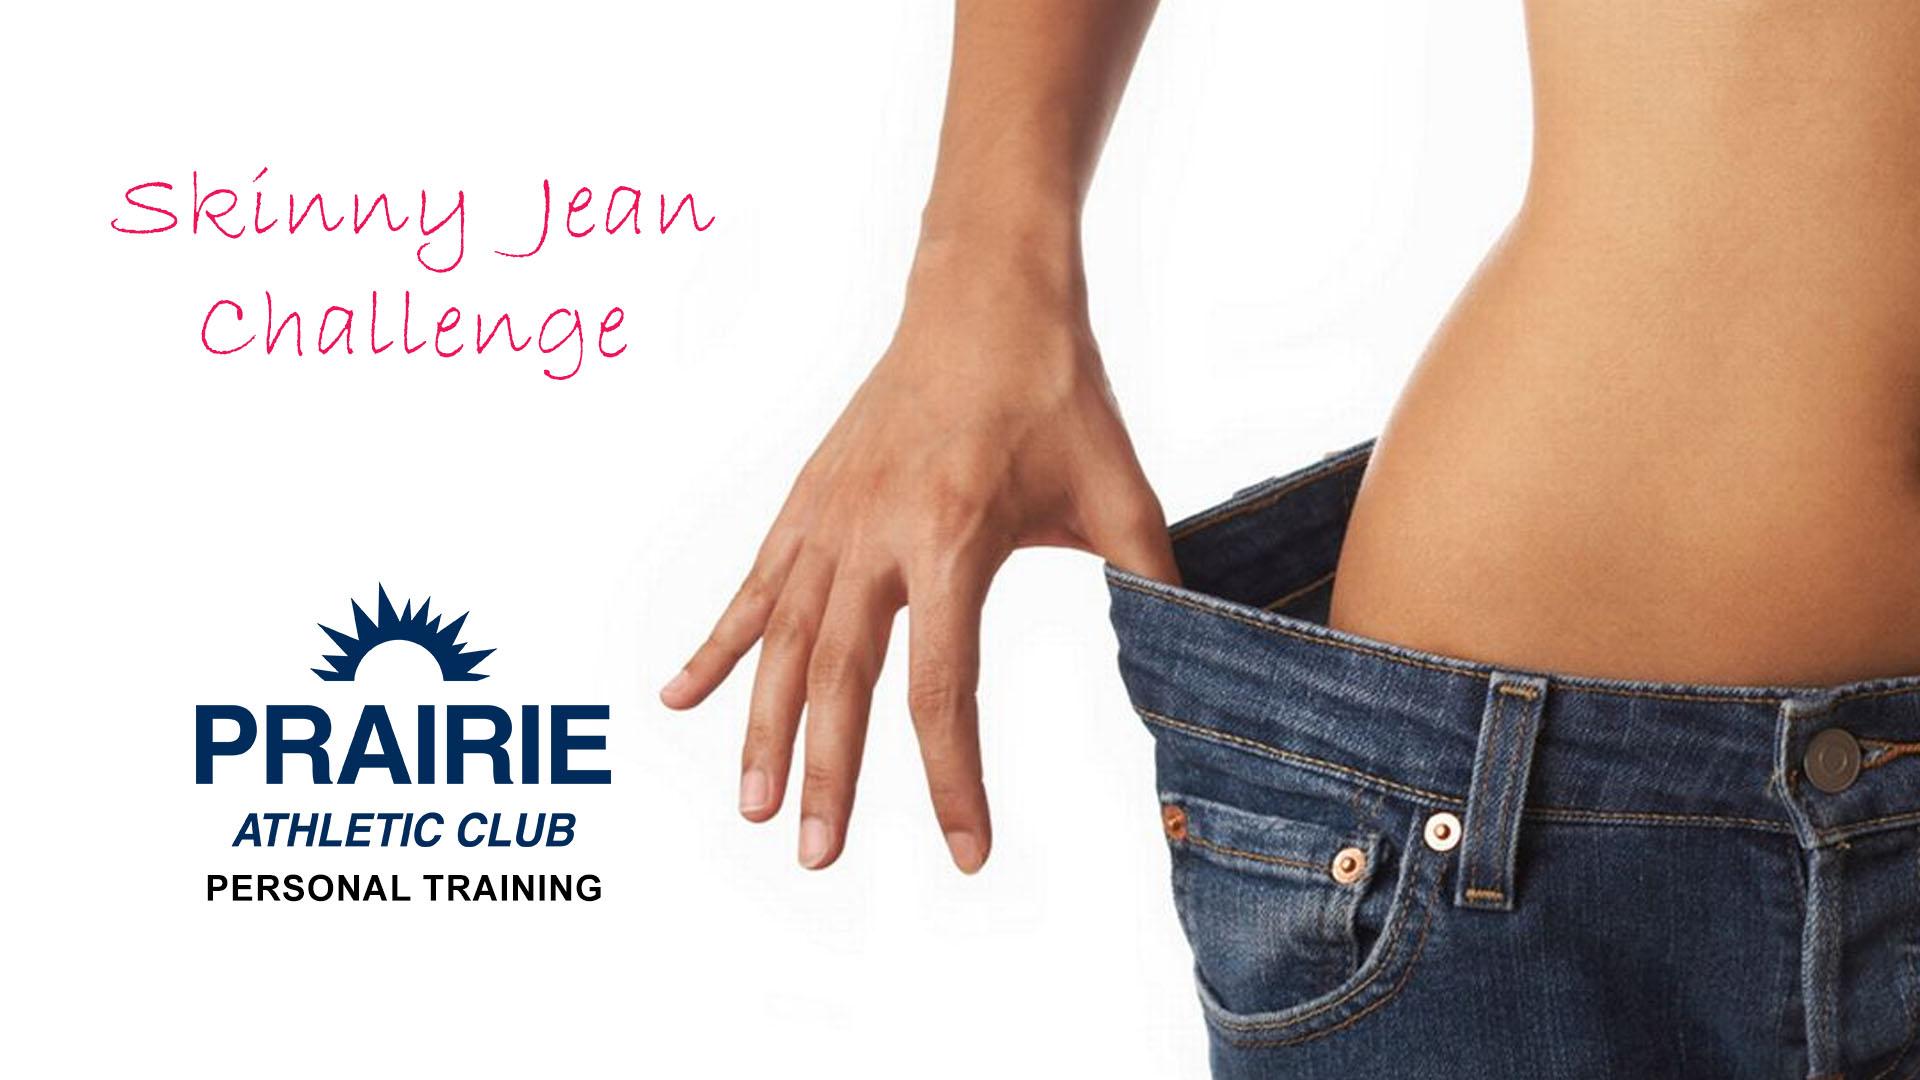 Skinny Jean Challenge PAC